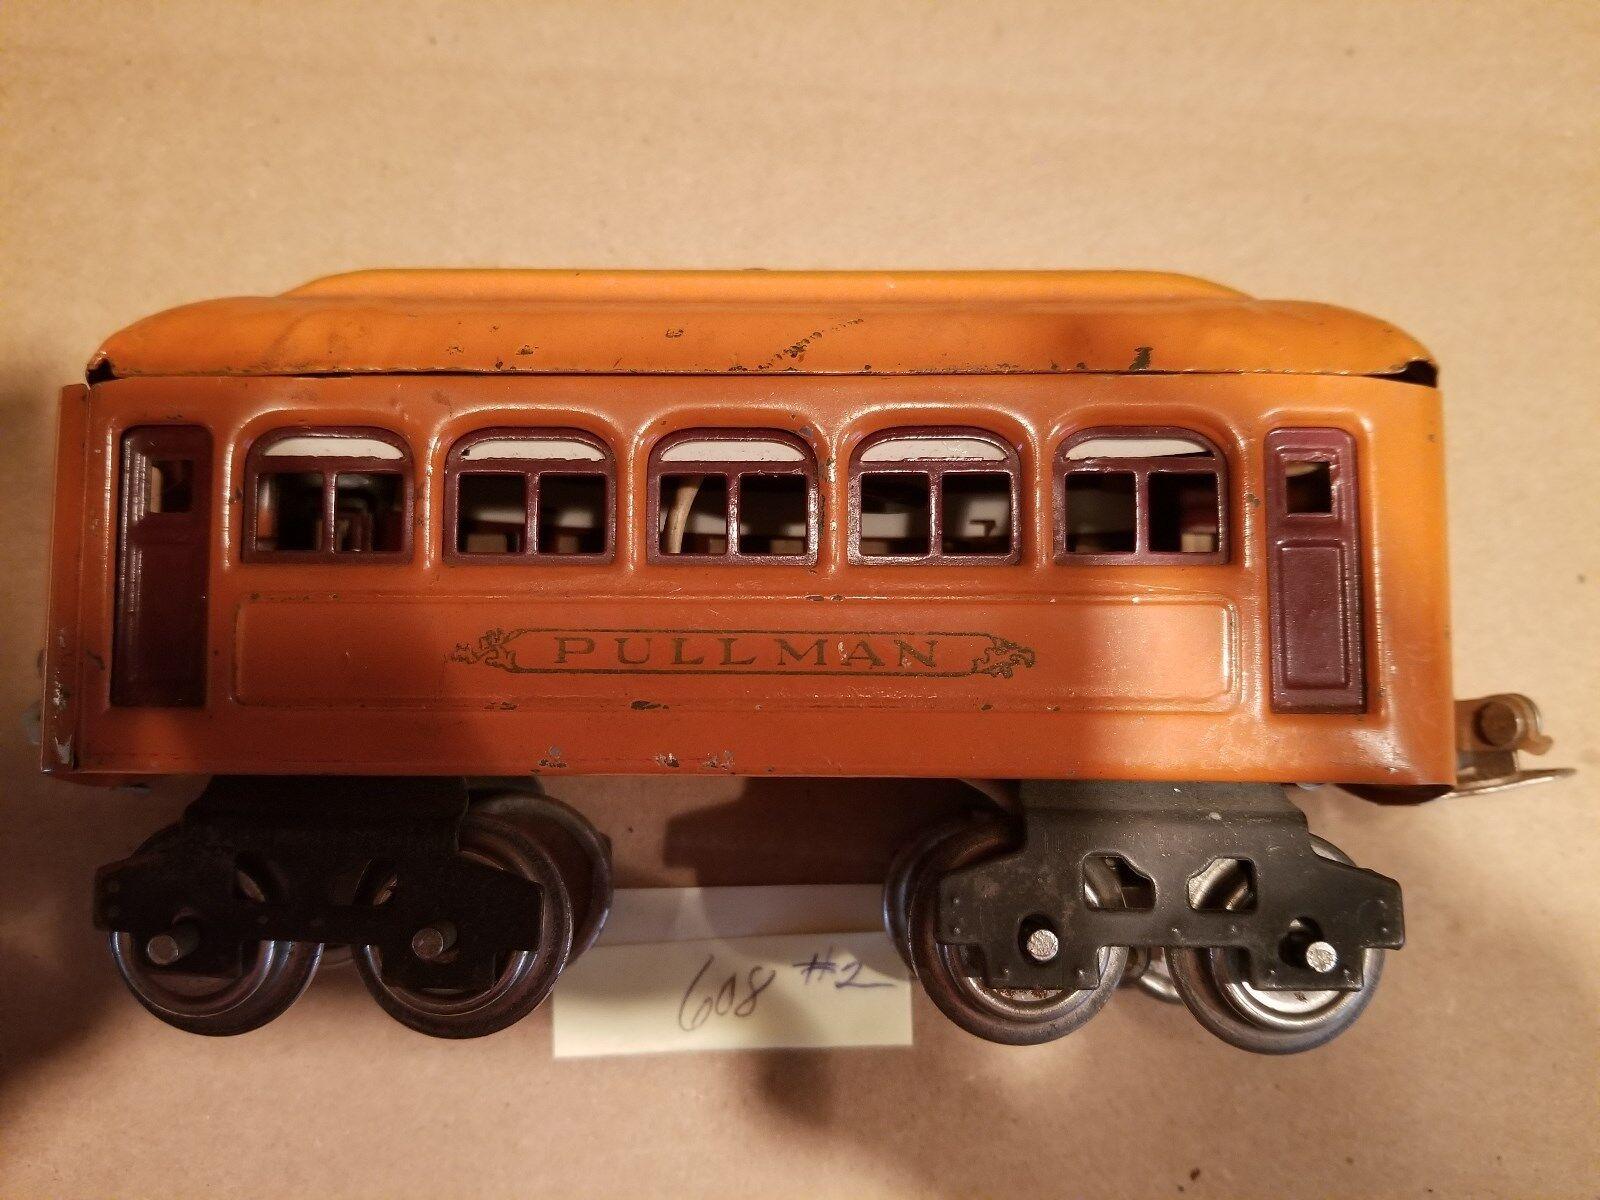 Lionel 608 Pullman Car 'O' Prewar 26-37 (JS)